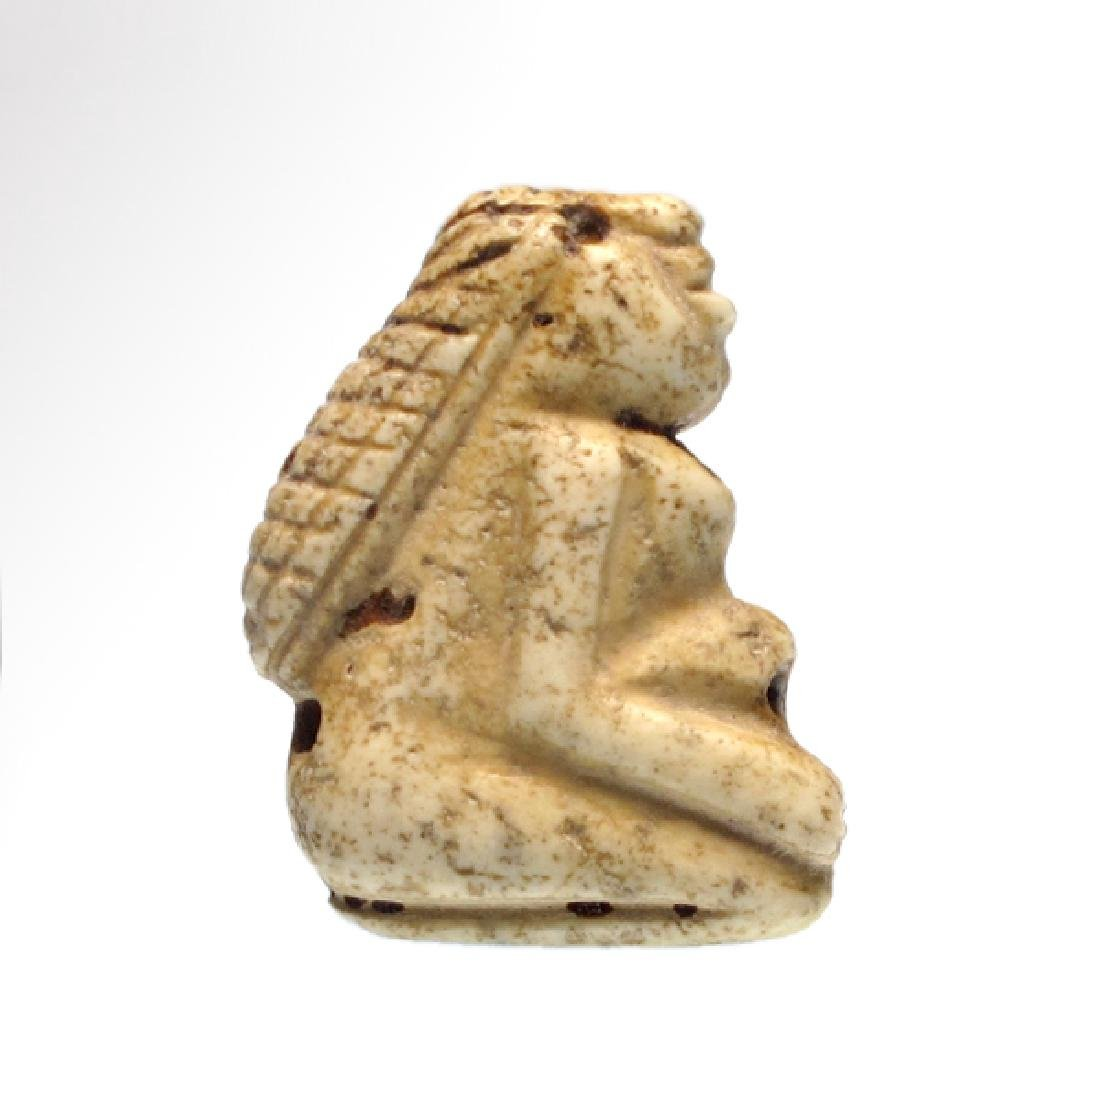 Sumerian Limestone Figure of a Lady Worshipper Seal, c.